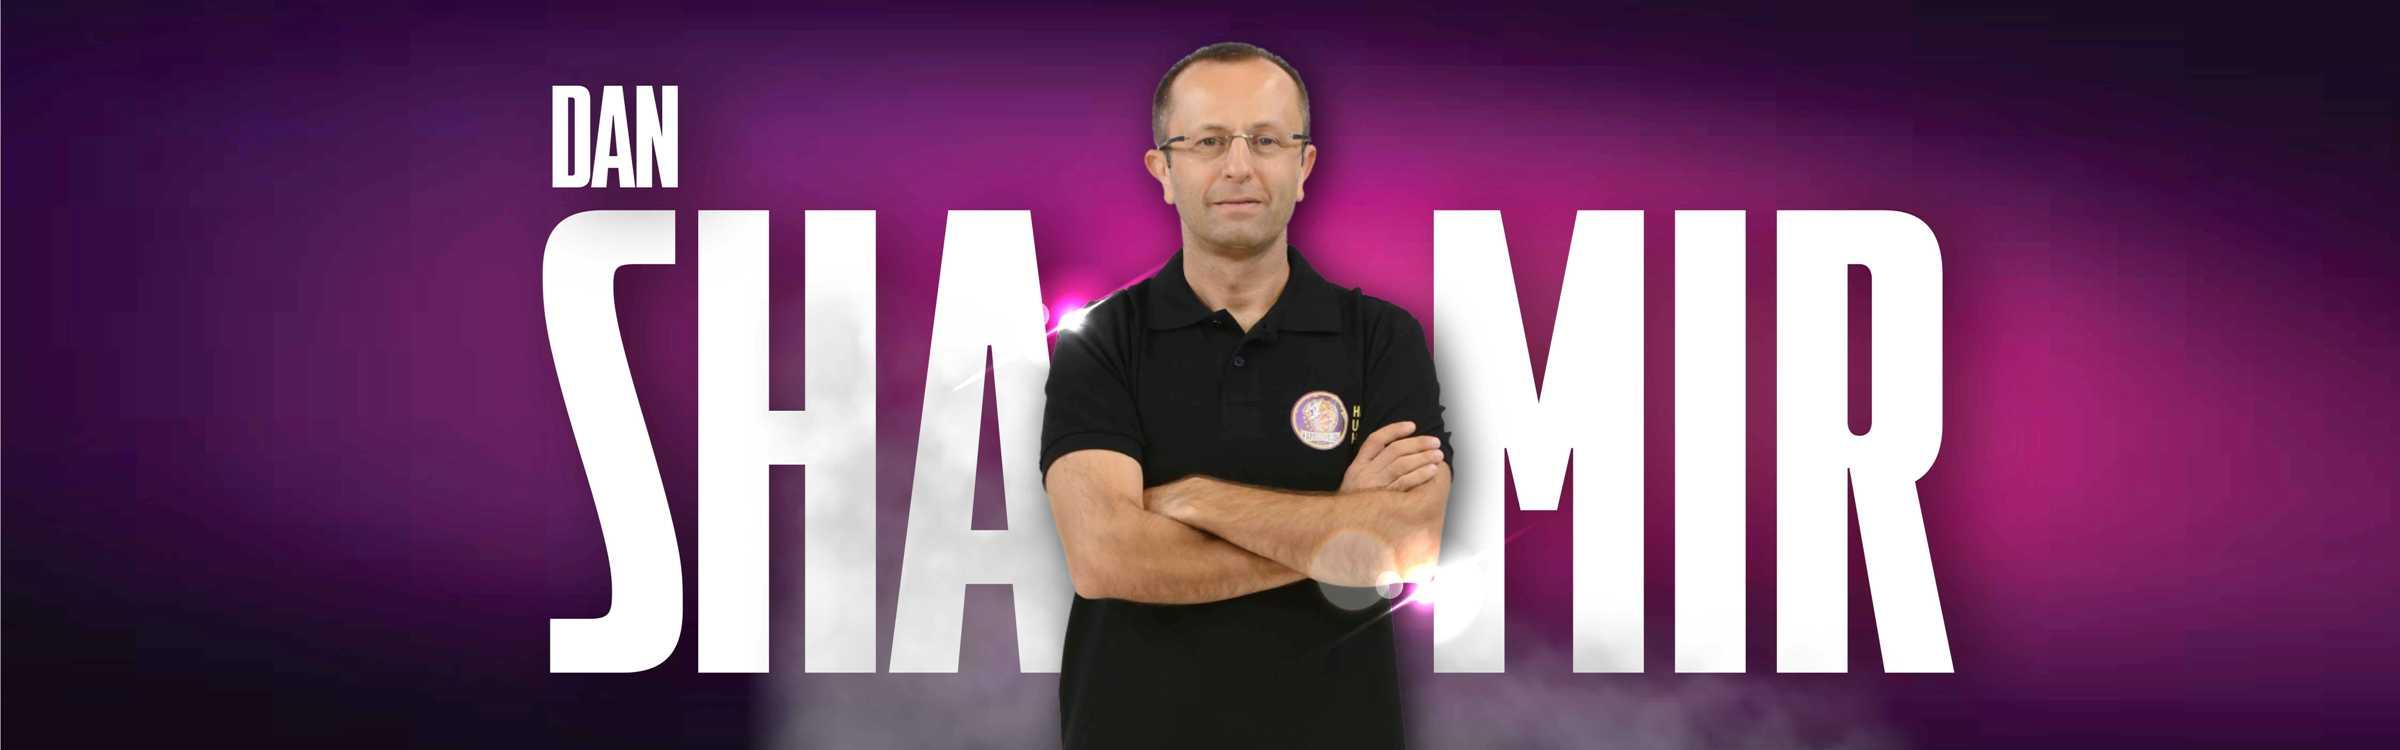 DAN SHAMIR